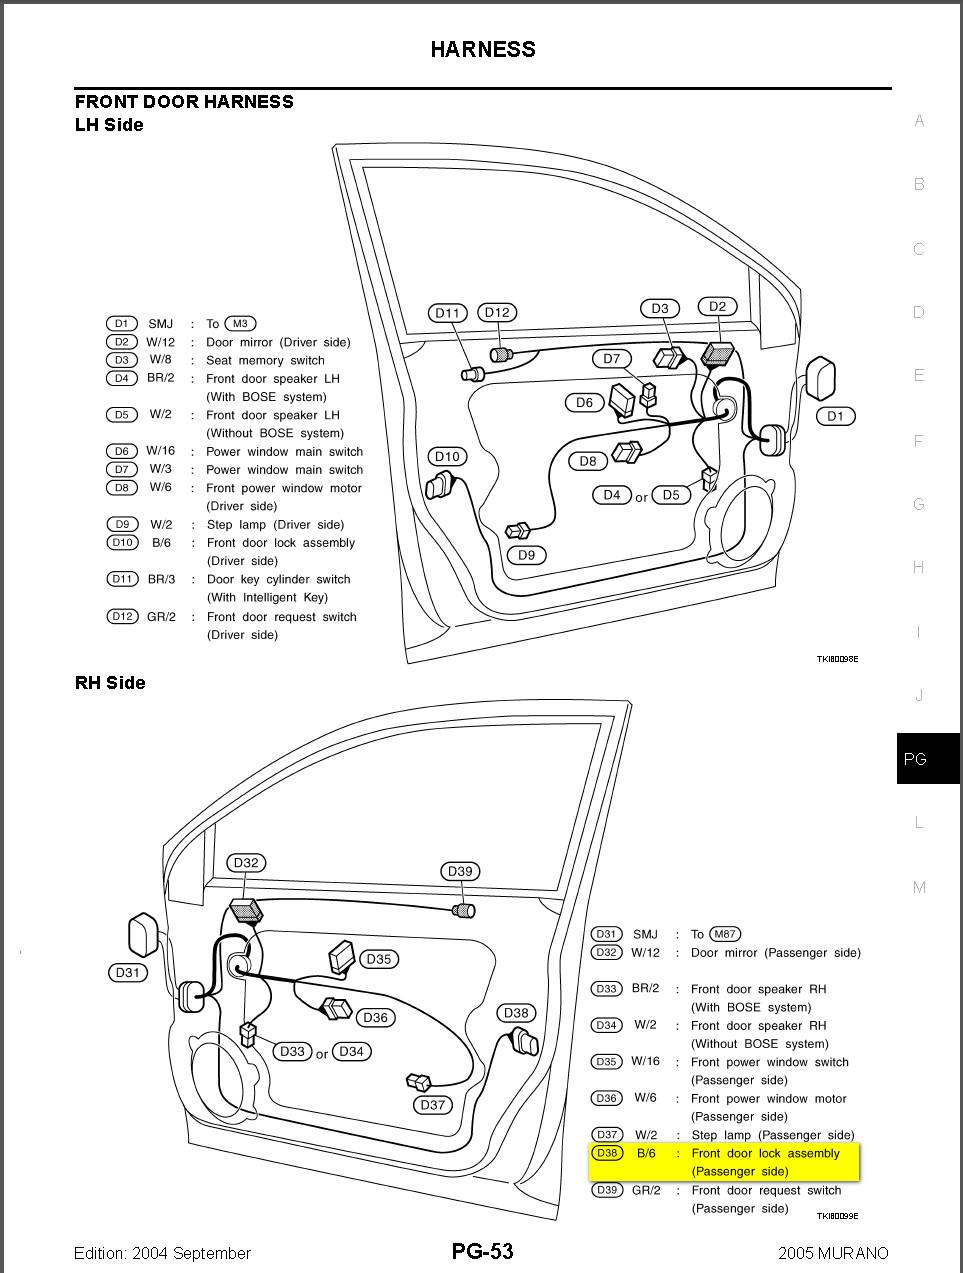 2005 nissan murano assemblyhatch lockssenger sidegoes away graphic vanachro Image collections